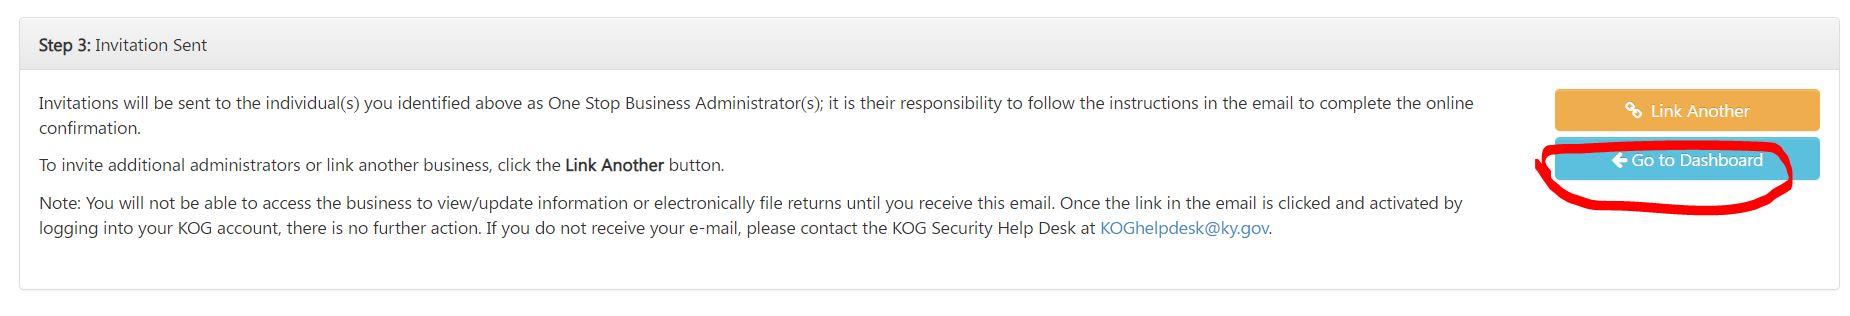 Amerikada sirket kurmak Onestop portal 5 Kentucky LLC'yi One Stop Portal'a Kaydedin